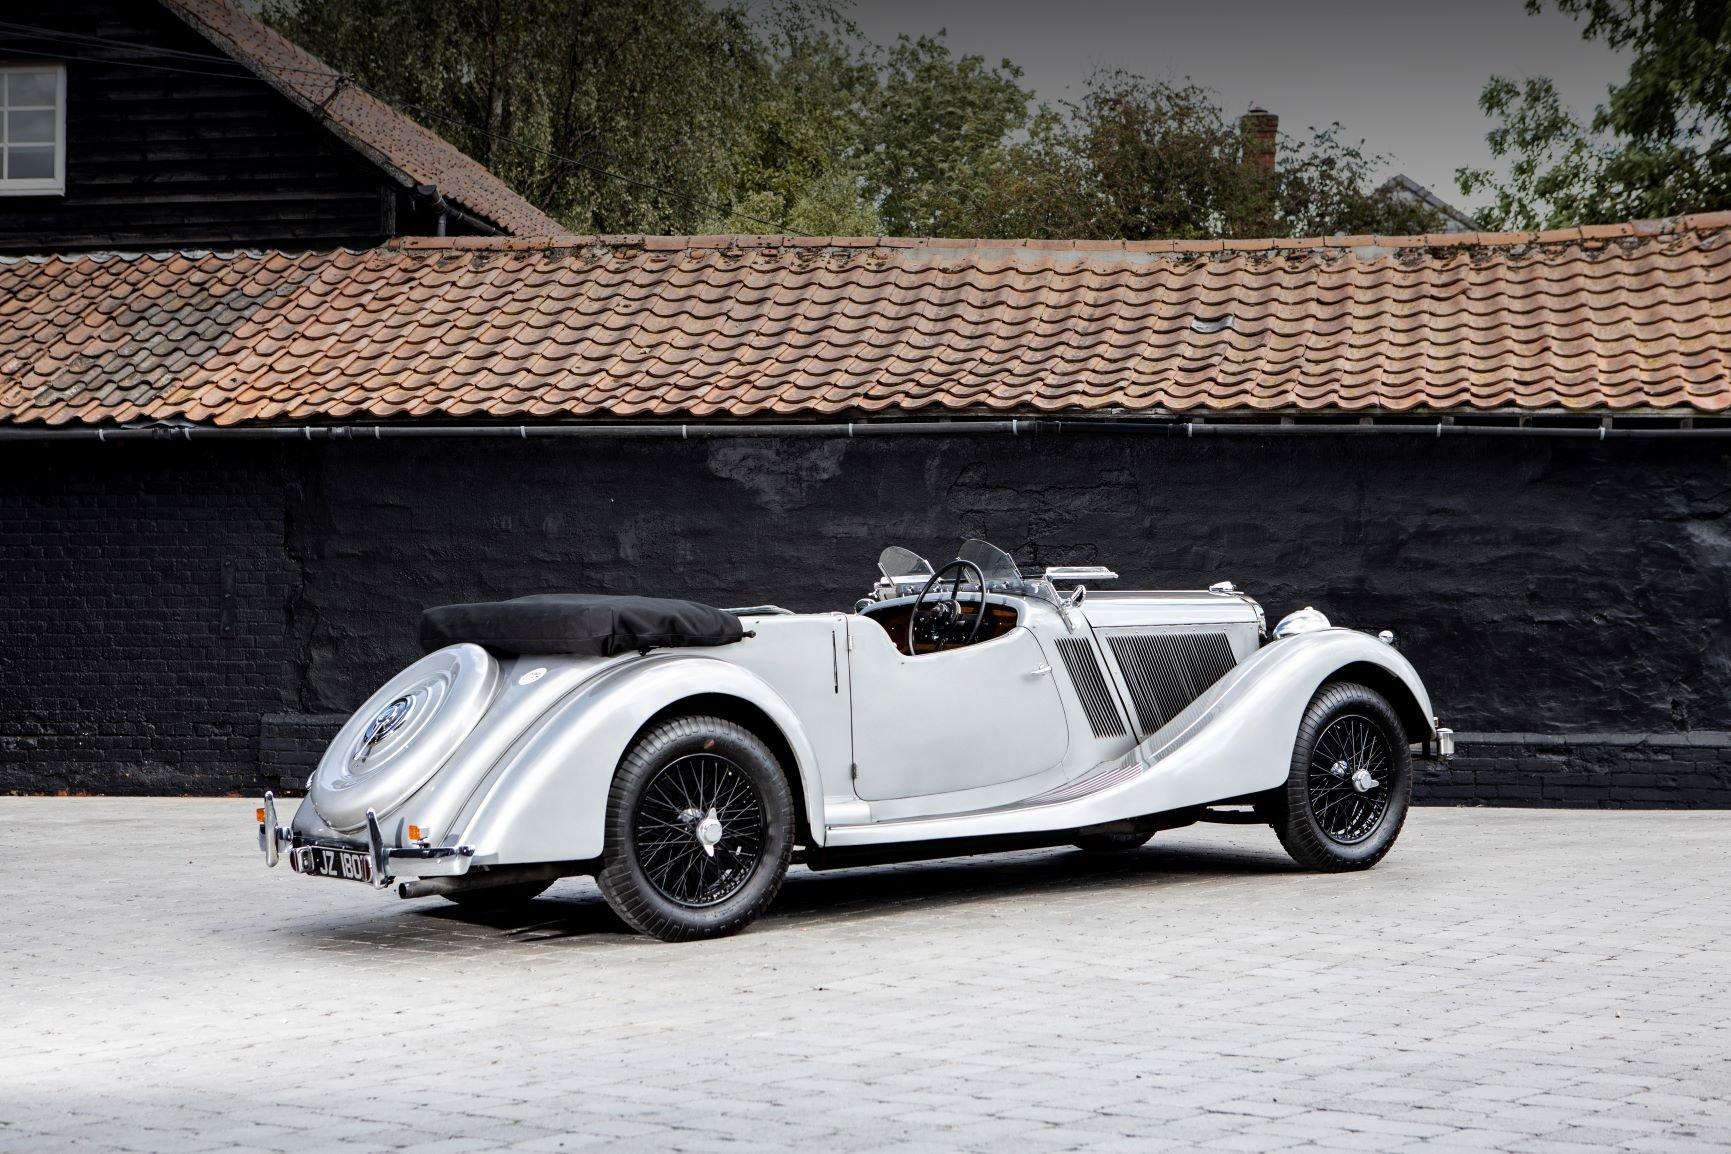 1937 Talbot BG110 Sports Tourer by Vanden Plas For Sale (picture 3 of 6)